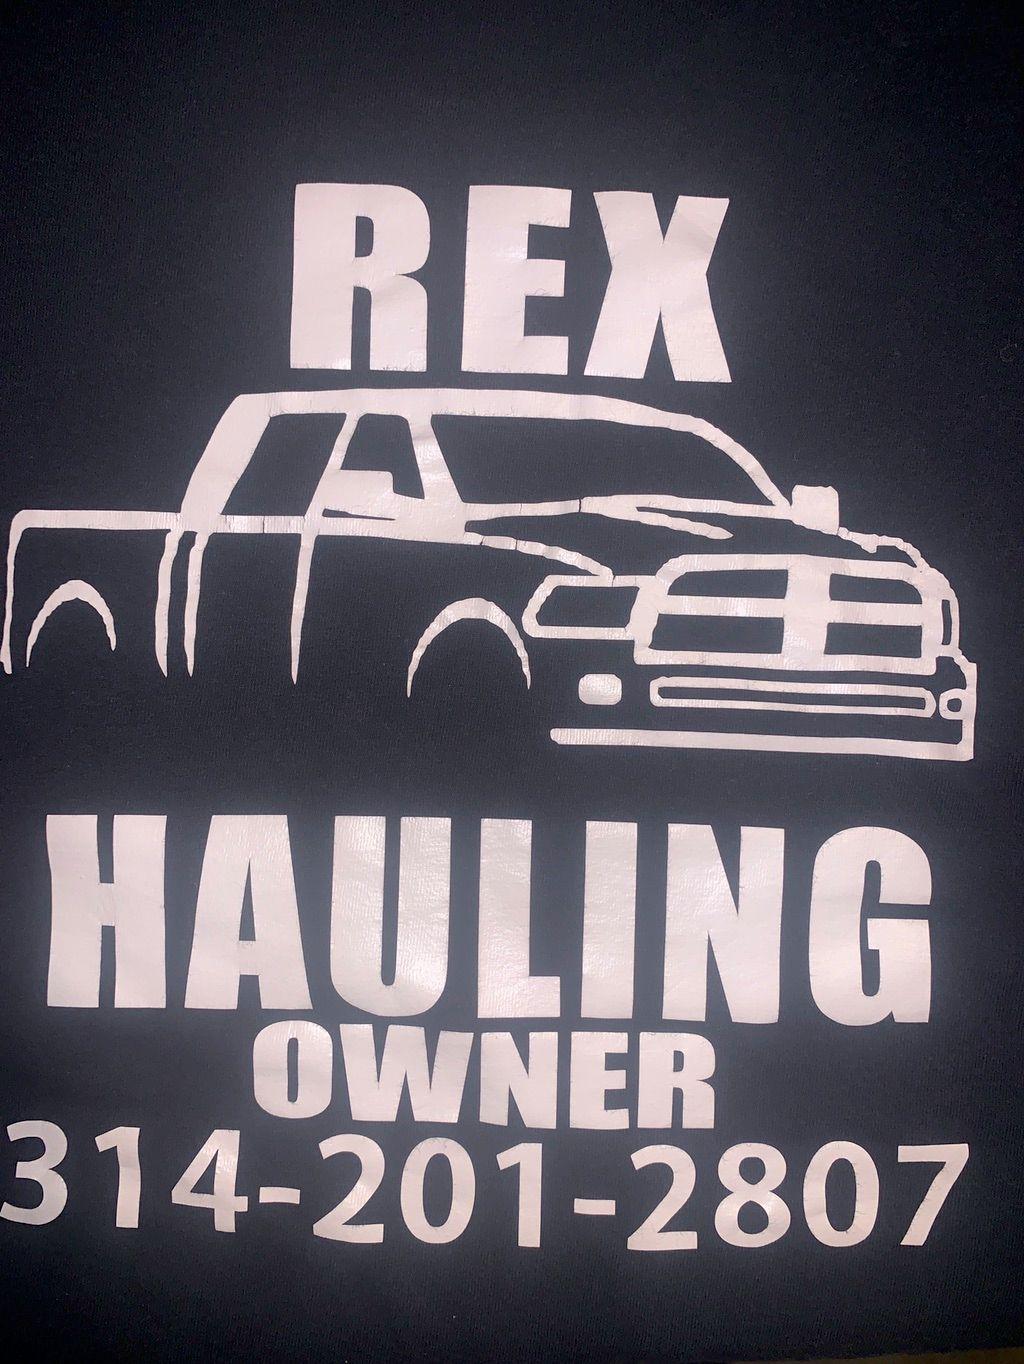 Rex's Hauling LLC